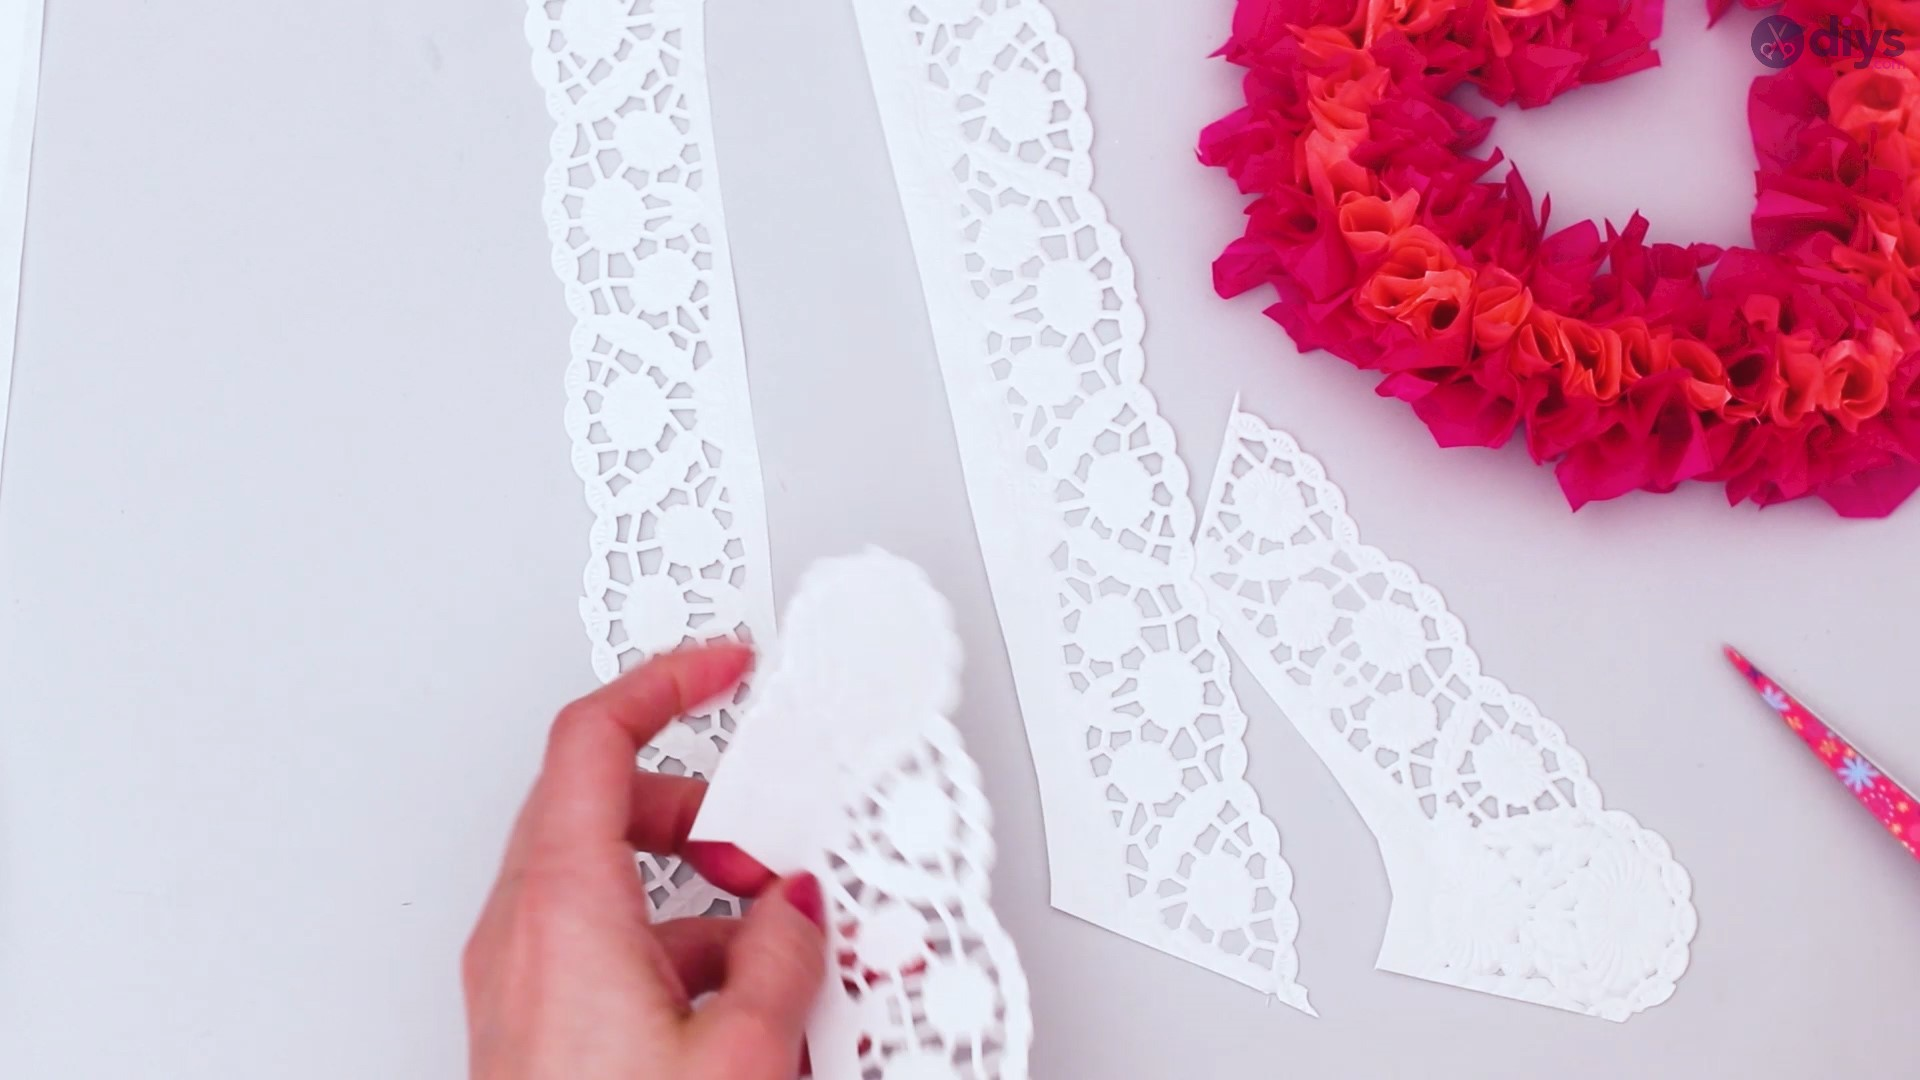 Diy tissue paper puffy heart step 1 (30)